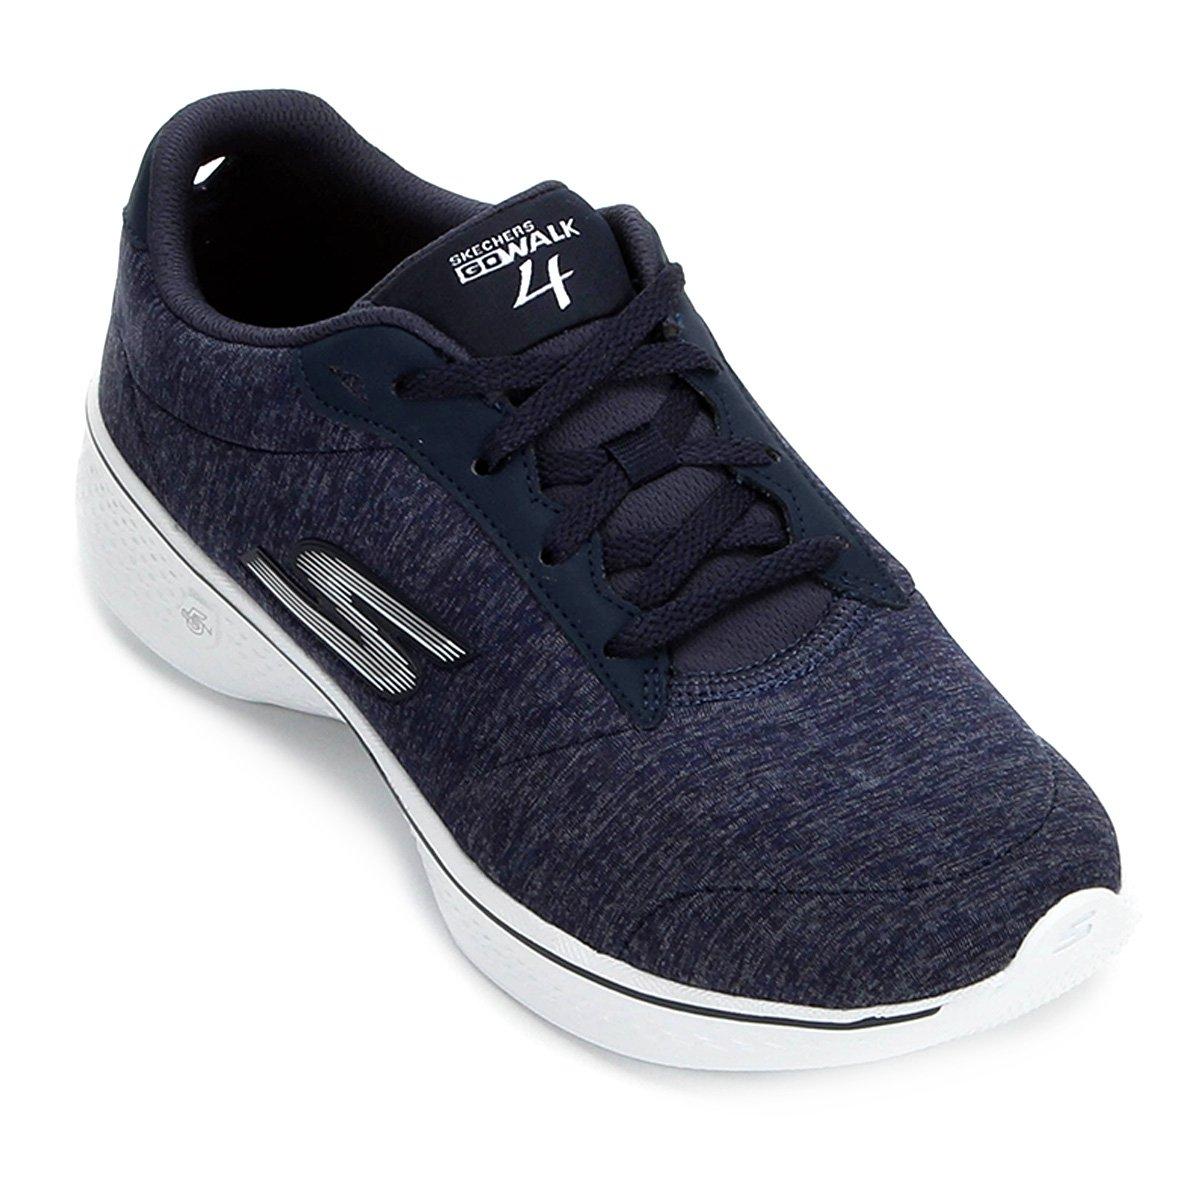 7f627cd92db Tênis Skechers Go Walk 4 Serenity Feminino - Azul e Branco - Compre Agora